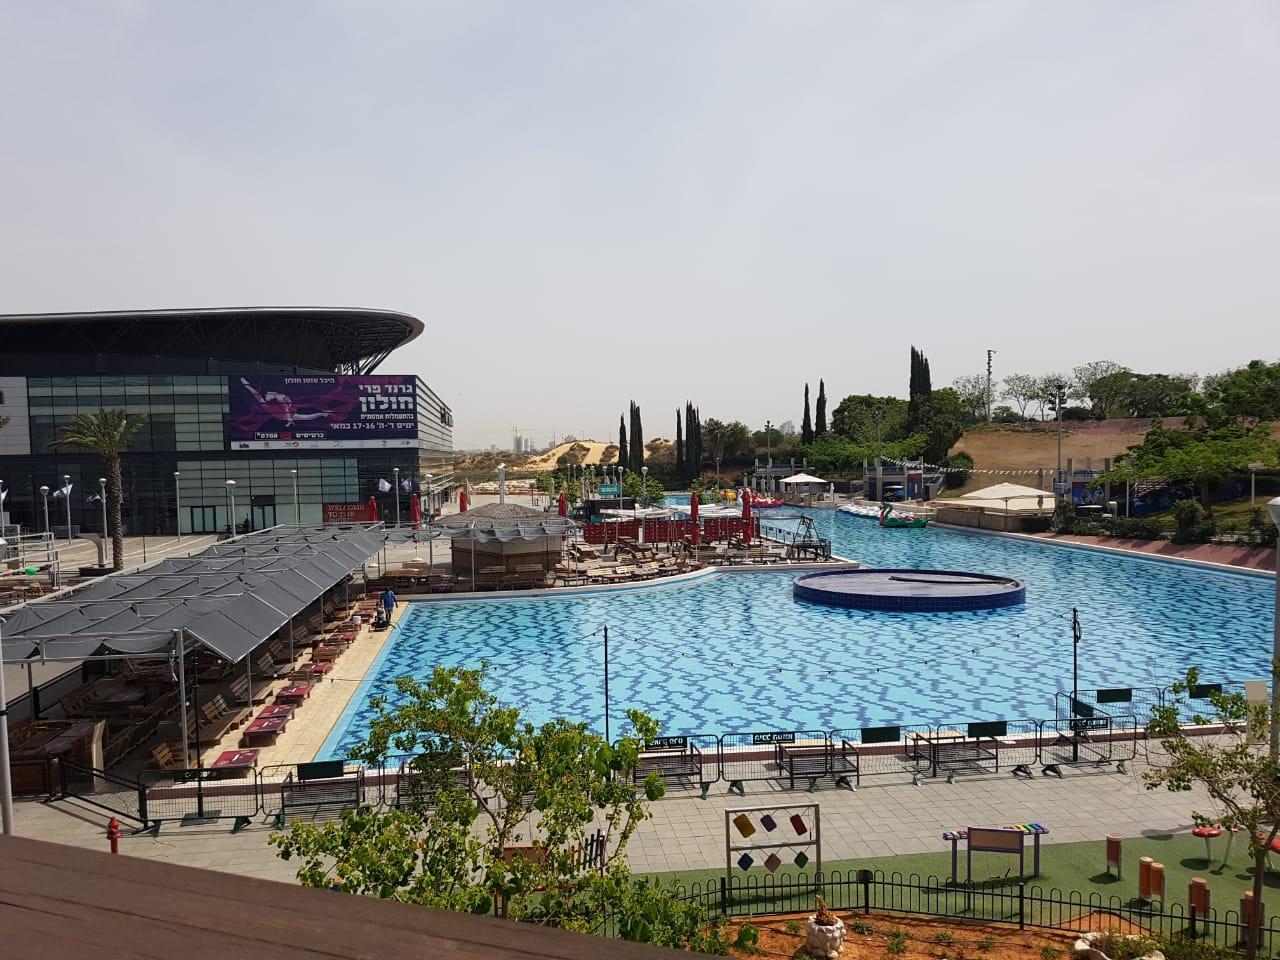 Peres- Park mit Basketball Arena